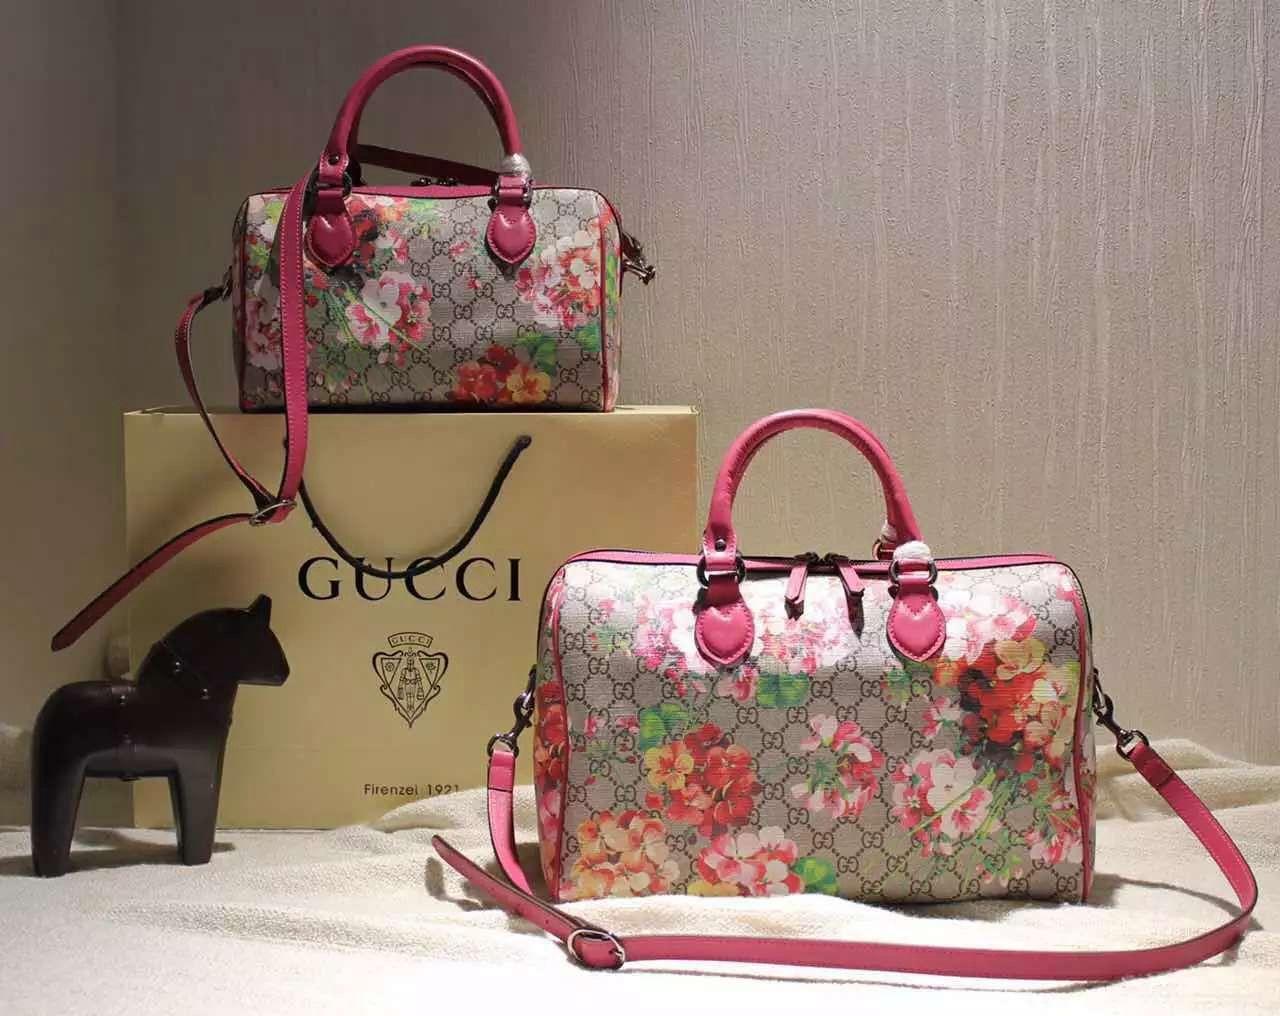 7dab58302c9 Gucci Small Blooms GG Supreme Top Handle Bag Fall 2015